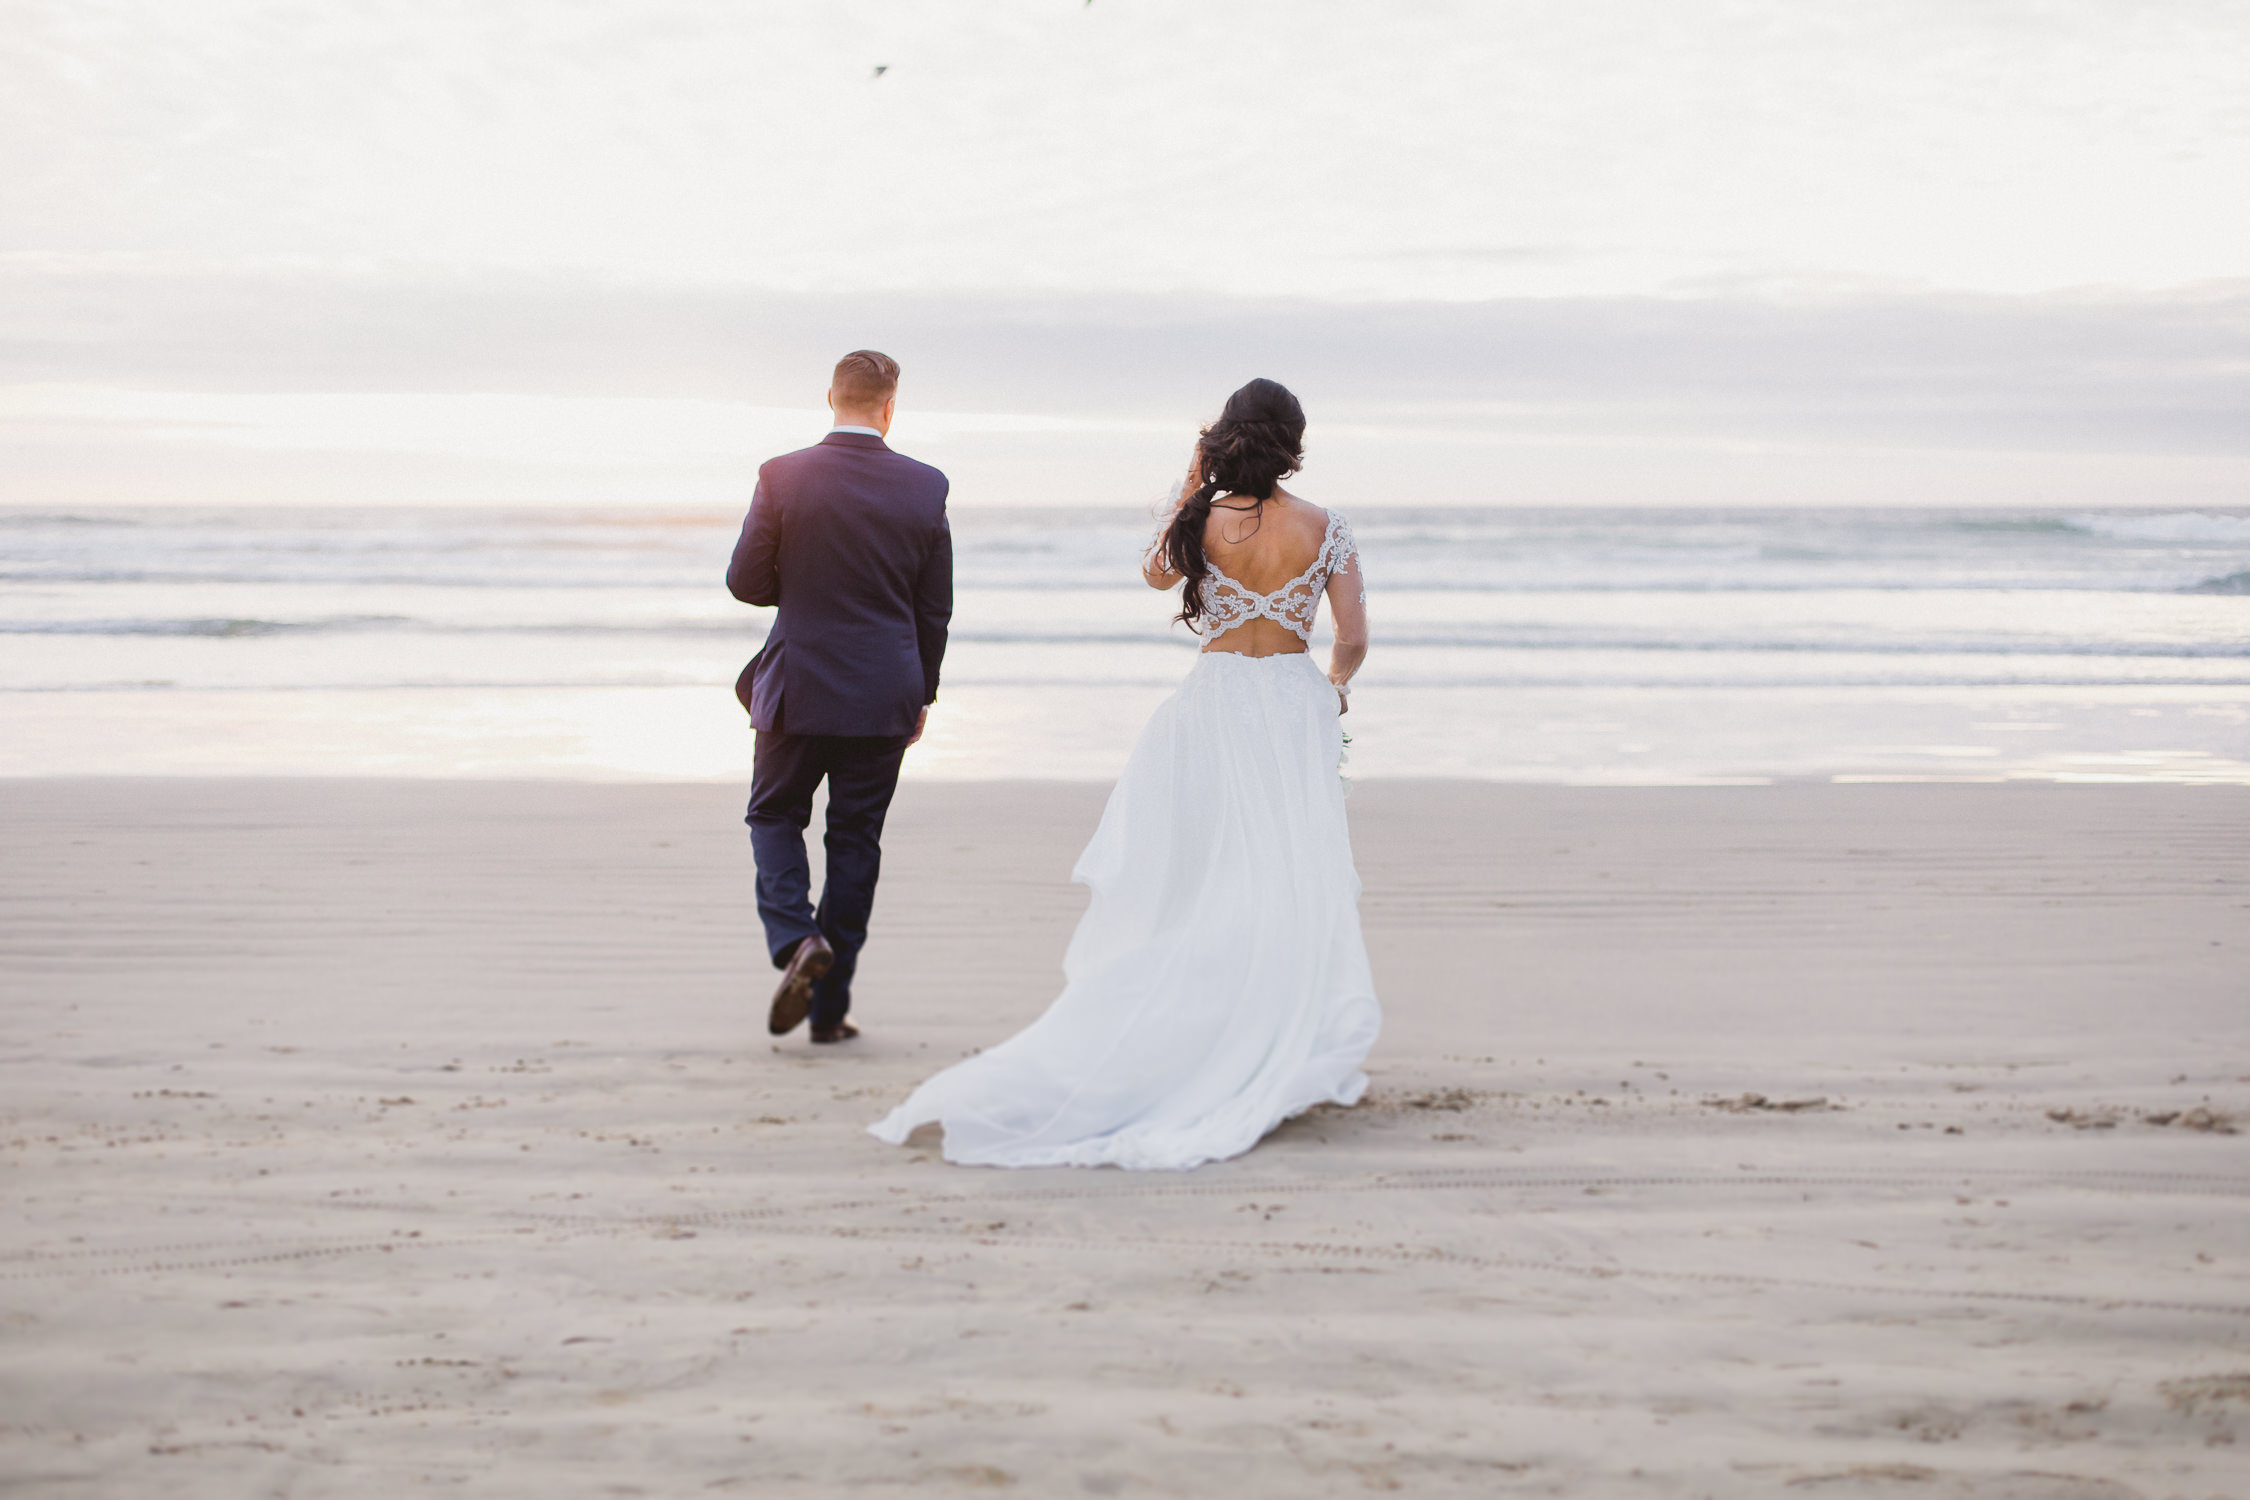 Beach+Wedding+San+Luis+Obispo+California+Ashley+rae+Photography.jpg